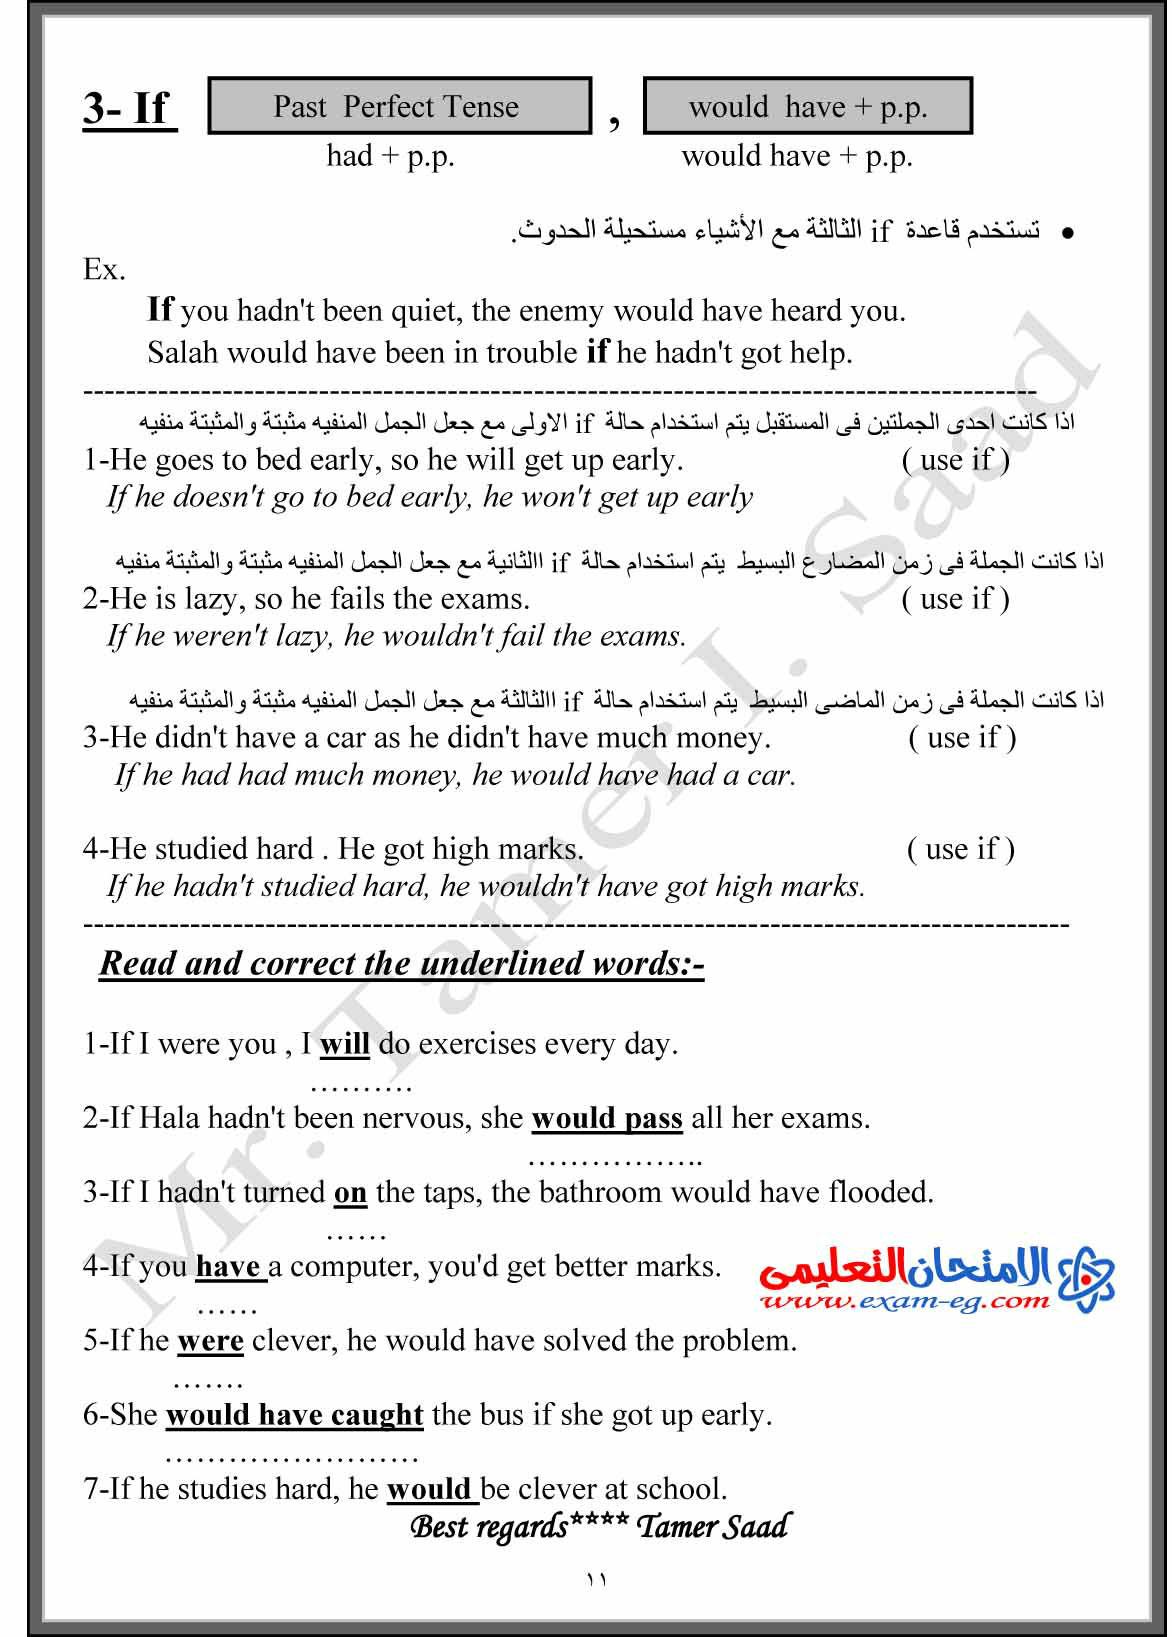 exam-eg.com_14428452402811.jpg